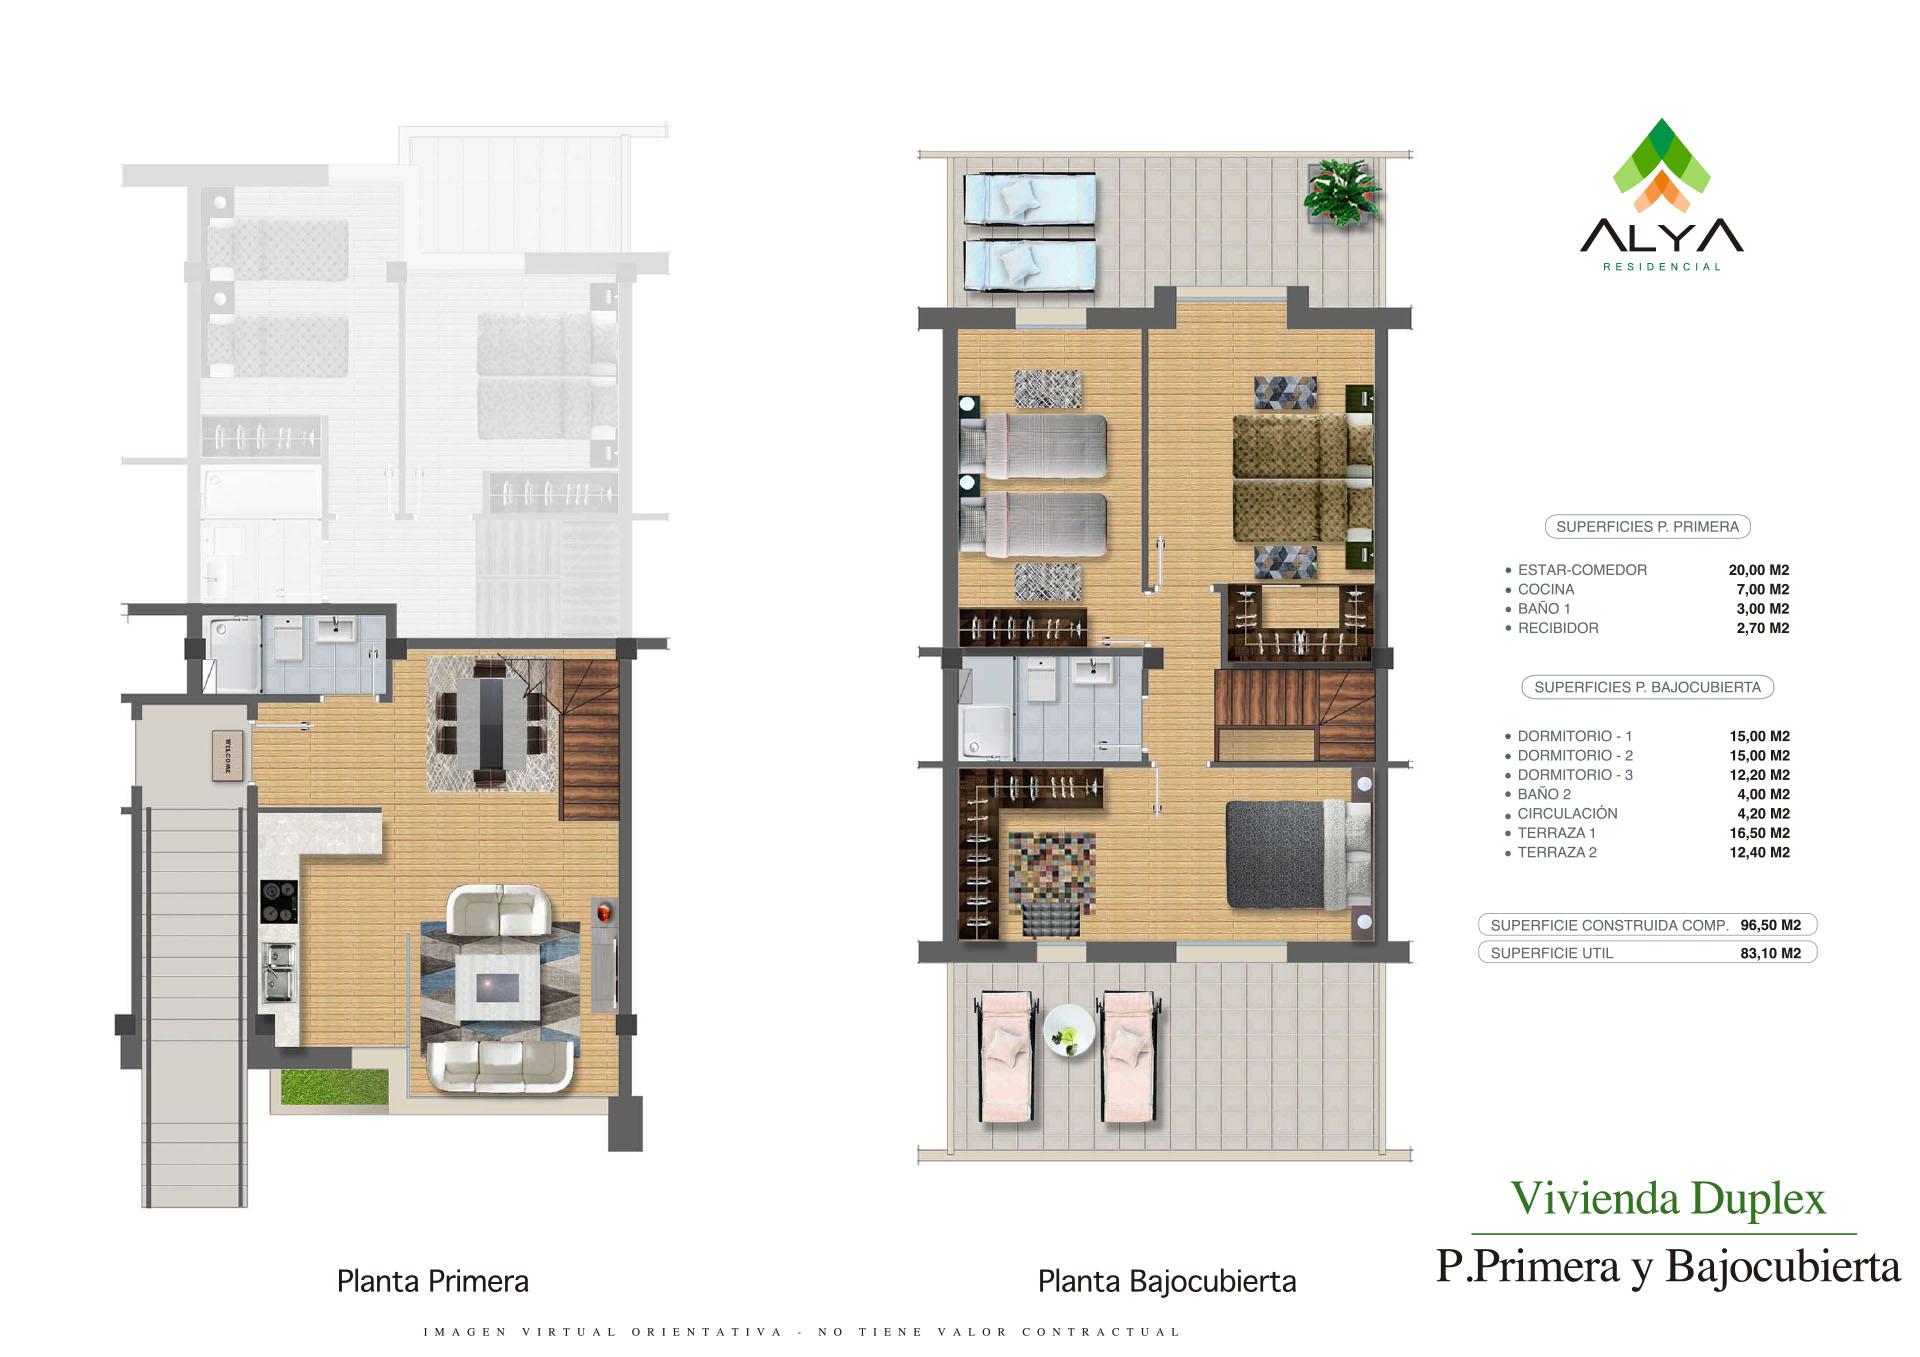 Residencial_Alya-Planta-primera-bajocubierta